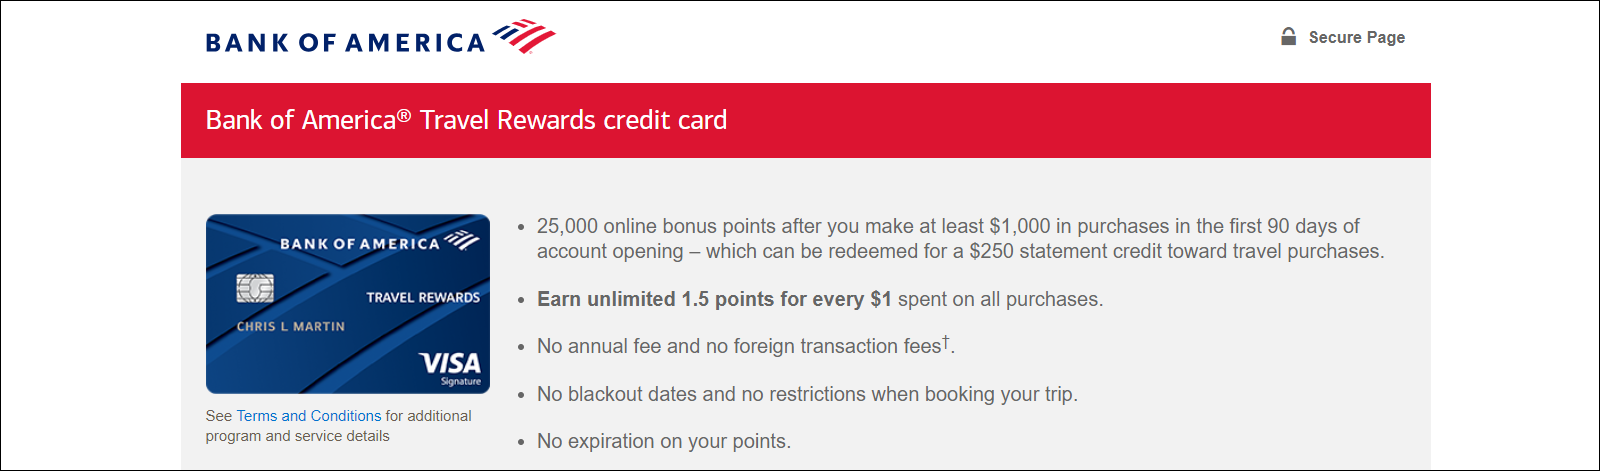 bank of america web site